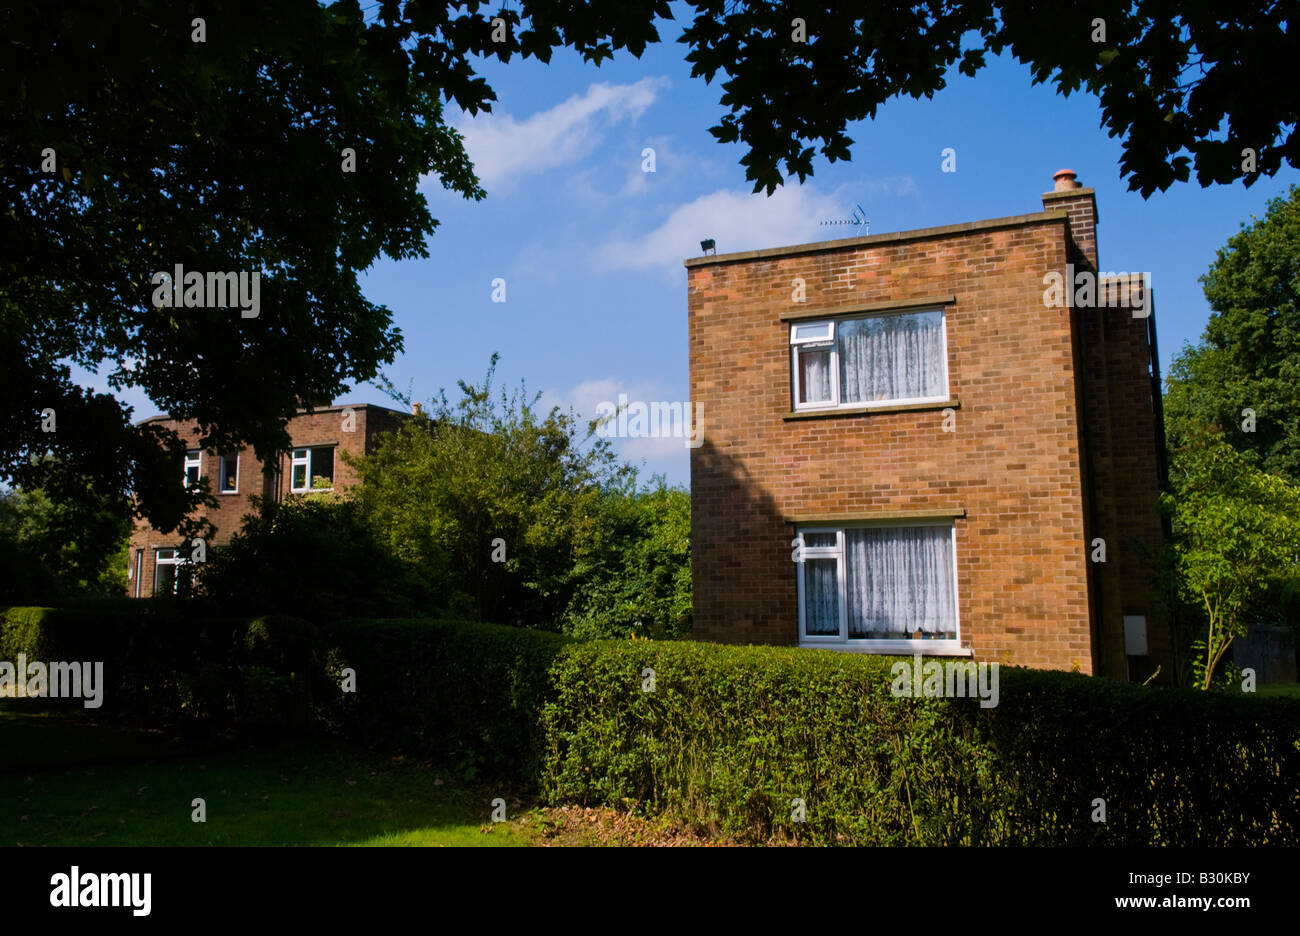 Casa indipendente costruita negli anni quaranta nelle zone rurali Rufford Nottinghamshire Inghilterra UK UE Immagini Stock